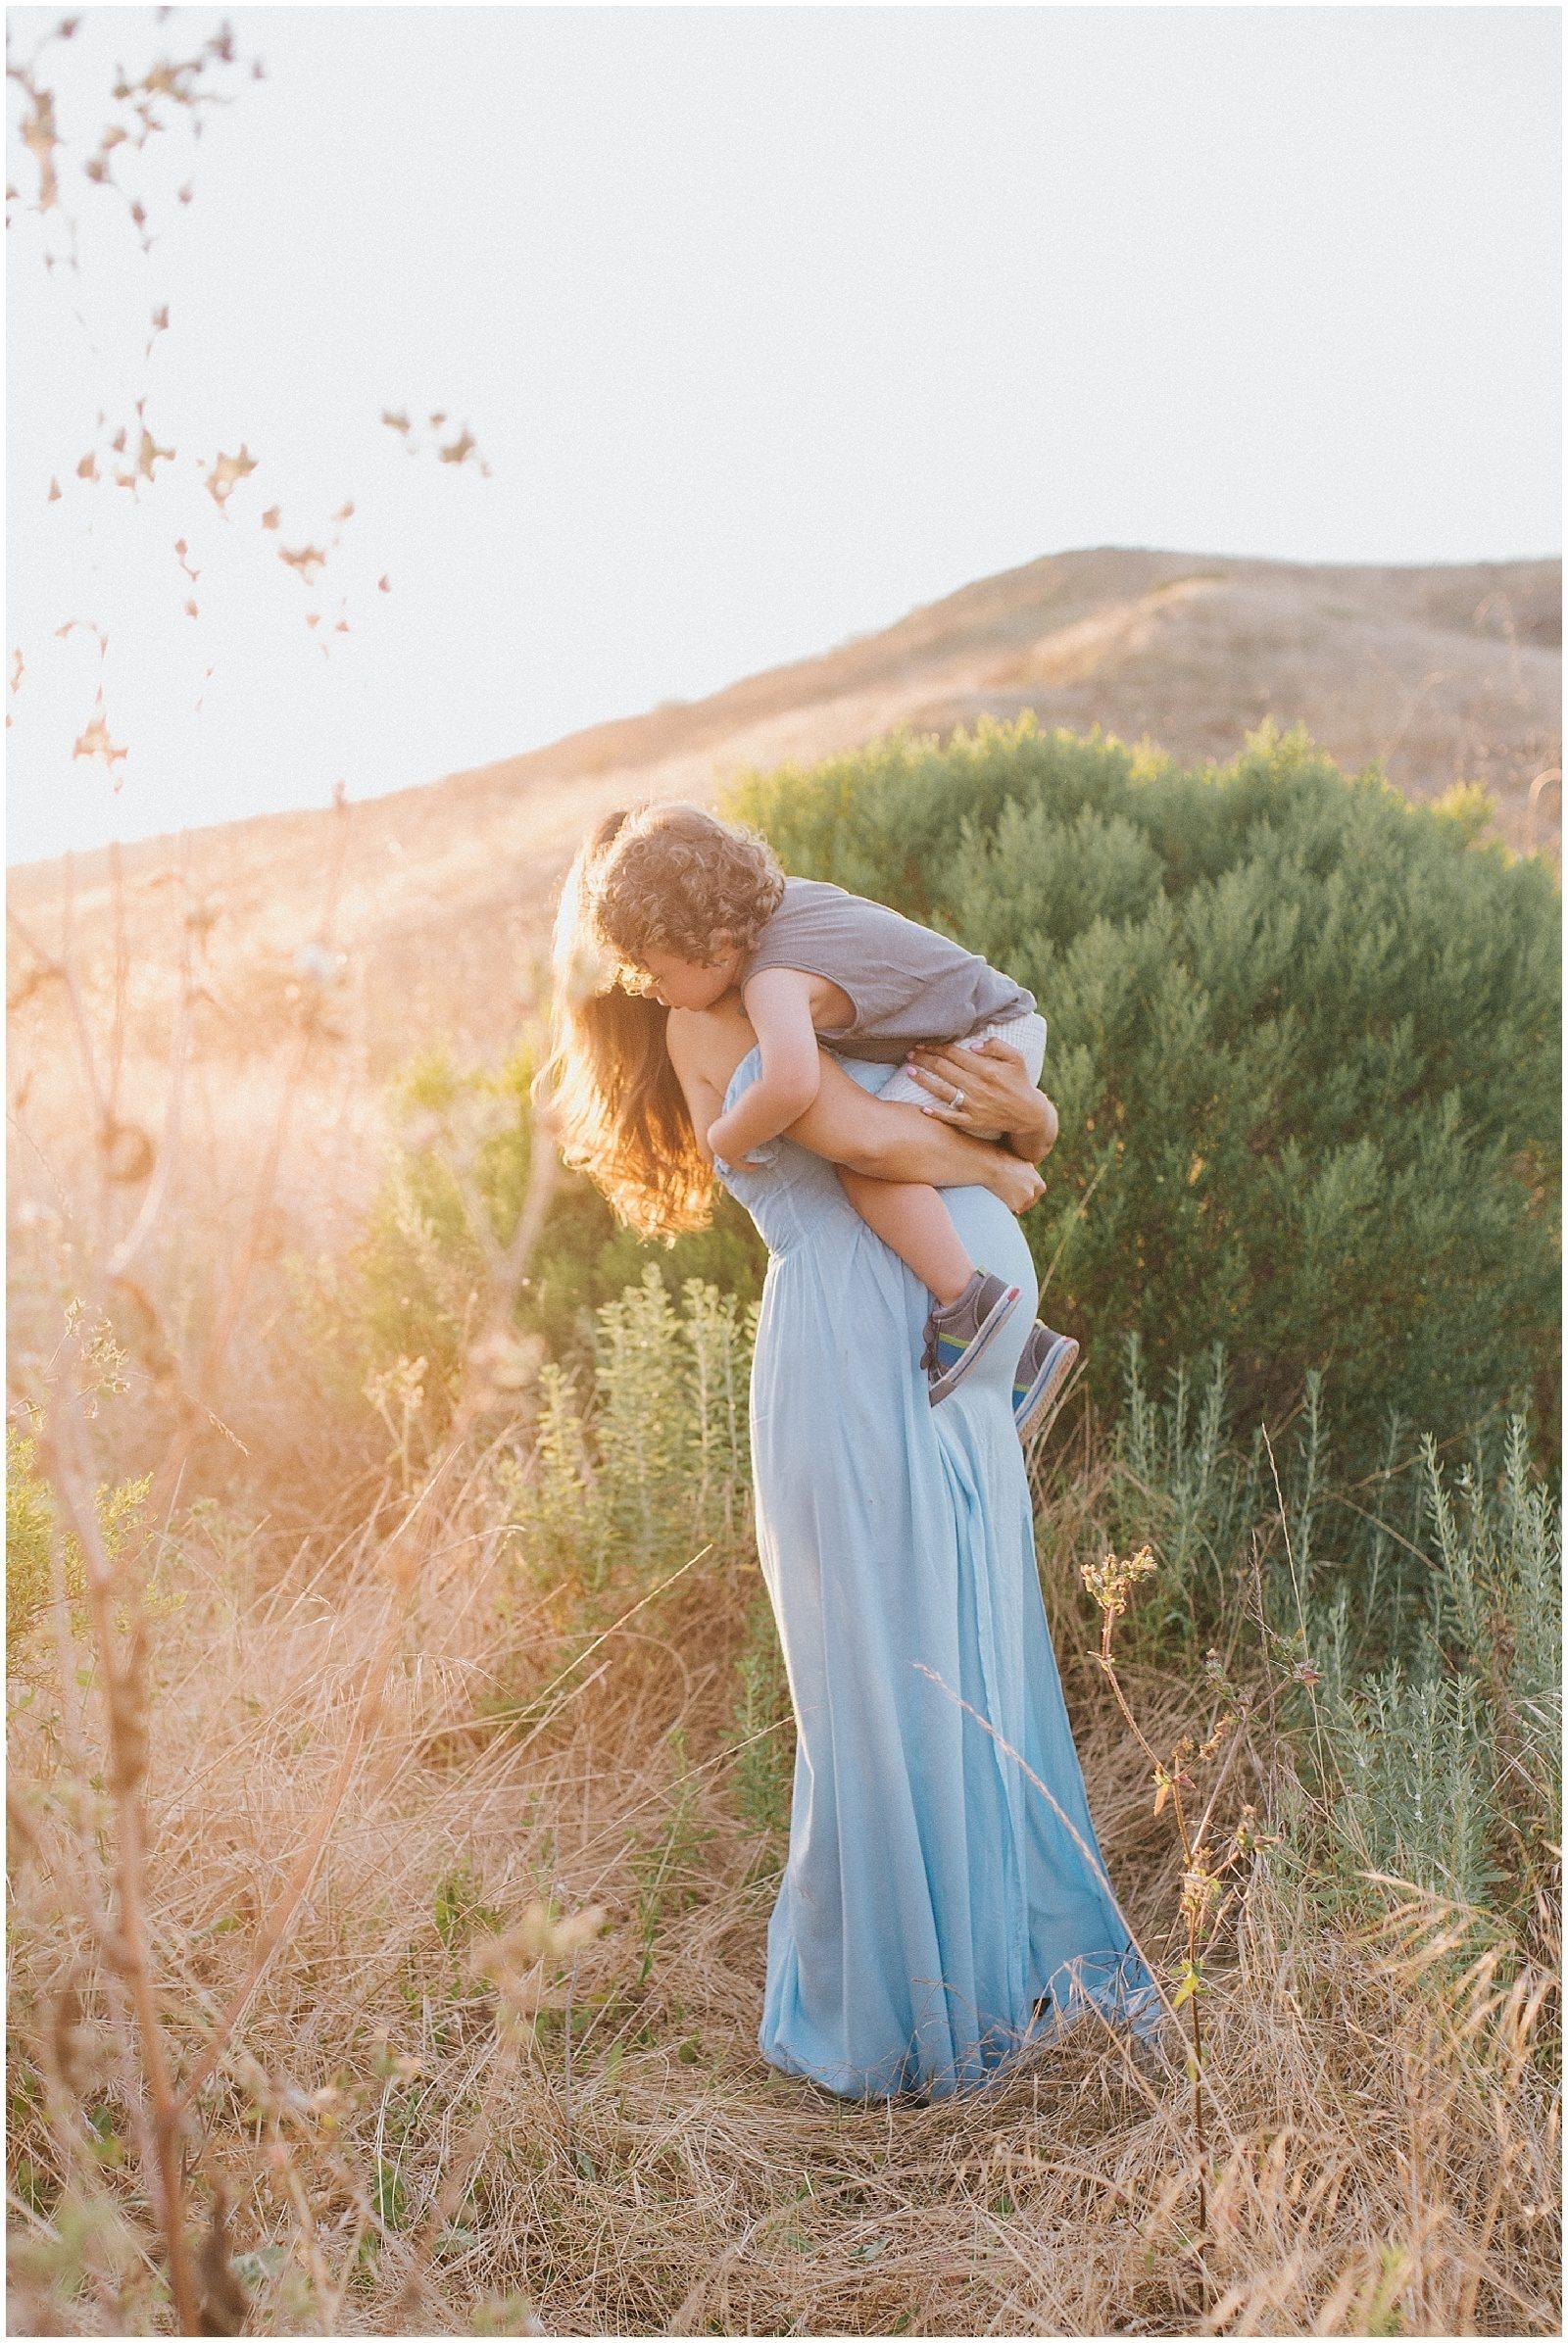 Orange County Maternity Photographer Sonja Hammad Photography 0080